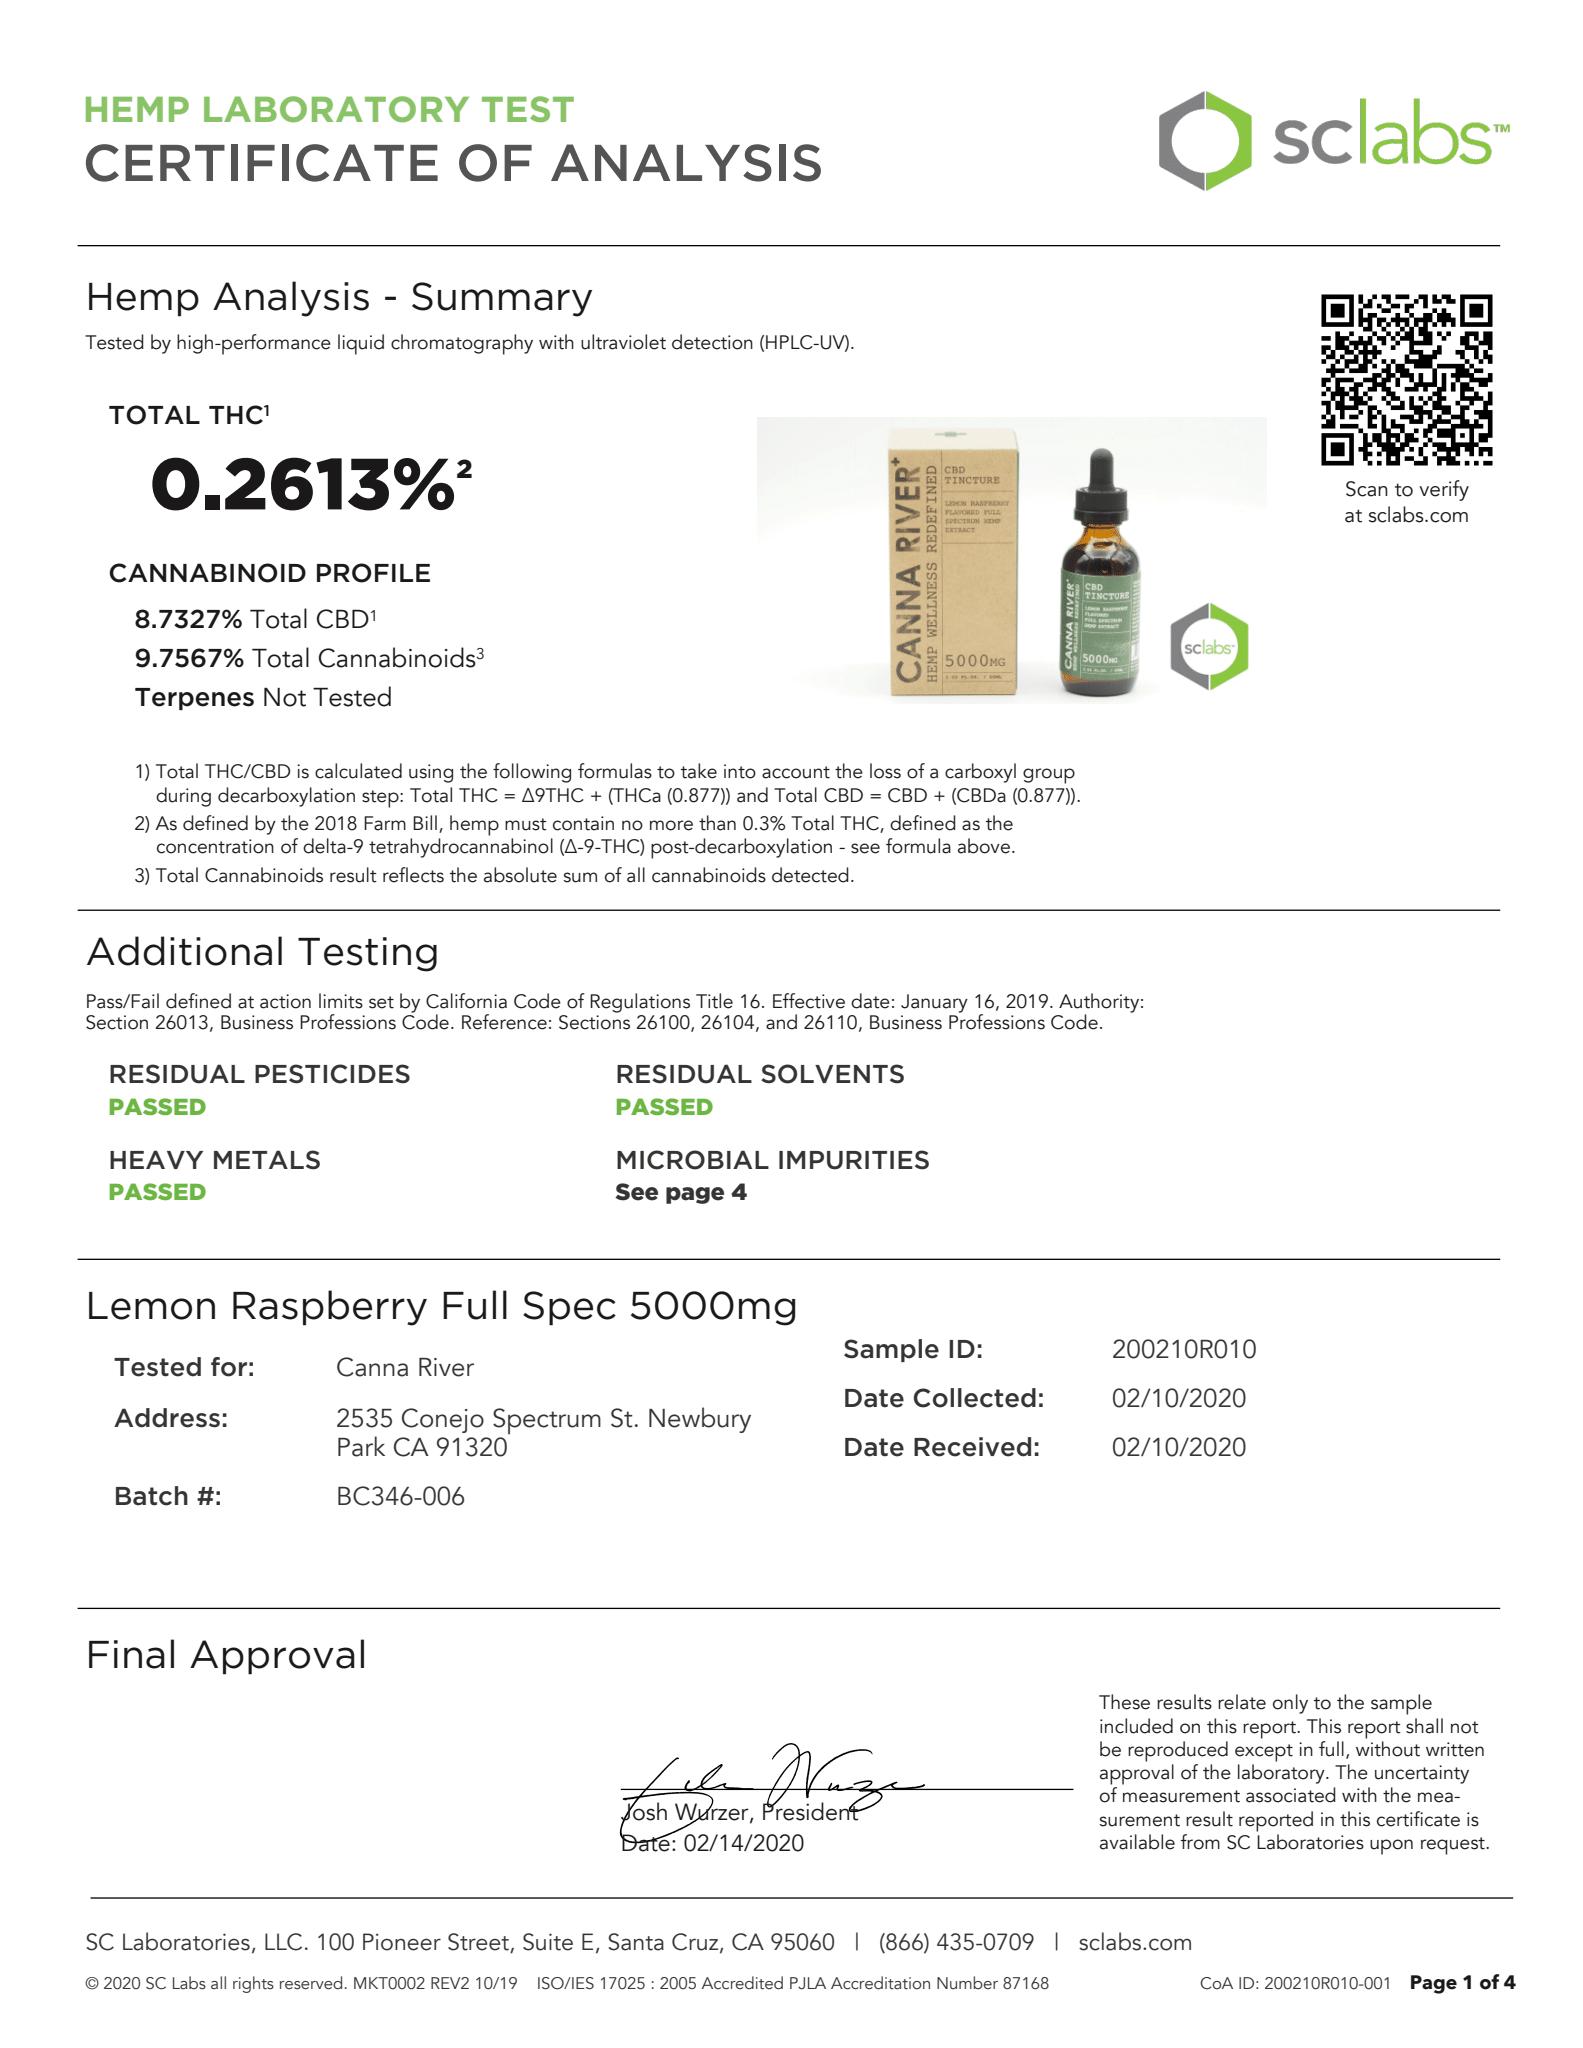 CANNA RIVER CBD Tincture Lab Report Full Spectrum Lemon Raspberry 5000mg